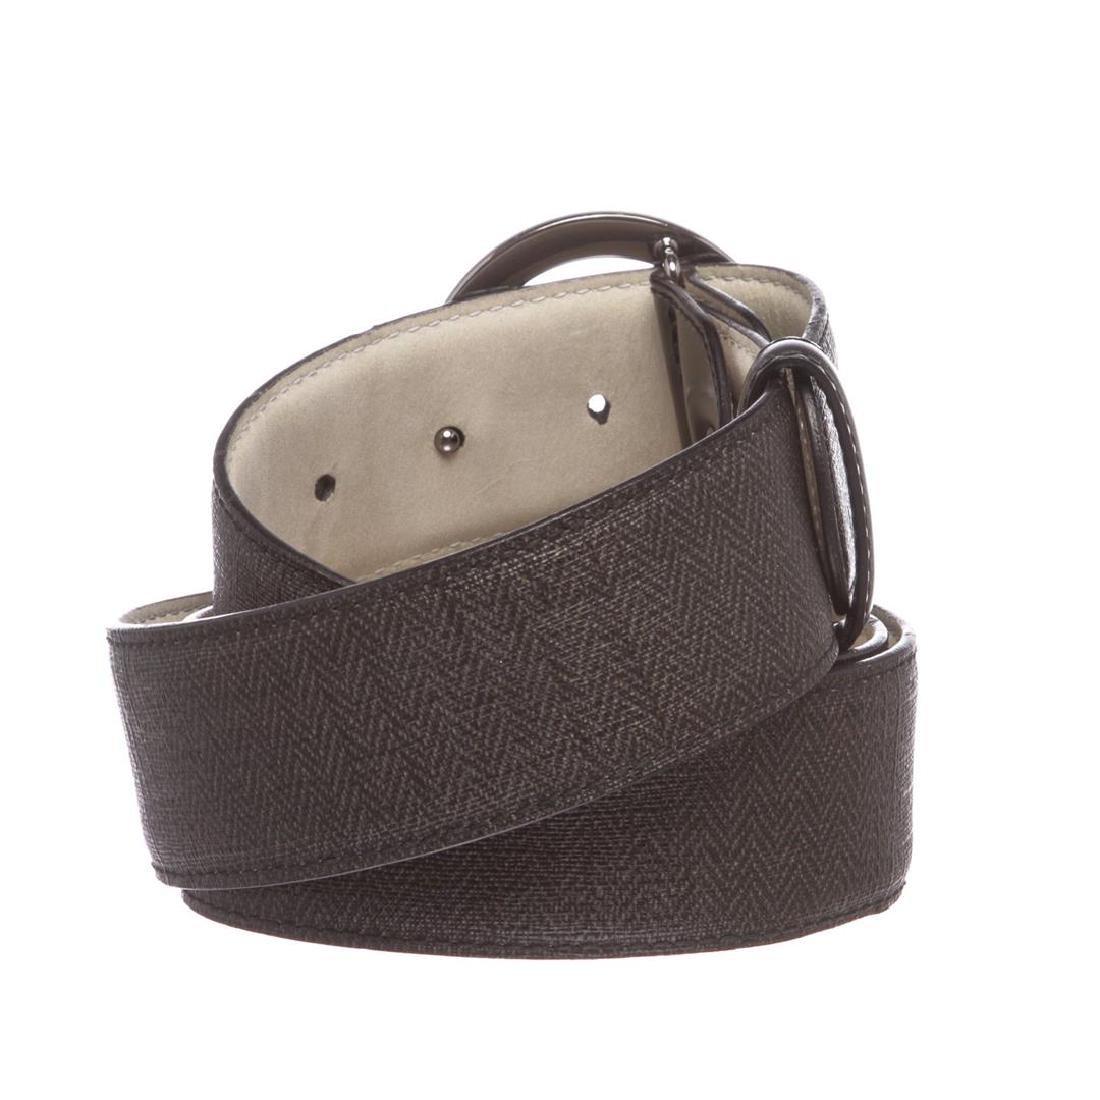 Bvlgari Black Gray Coated Canvas Leather Belt - 3